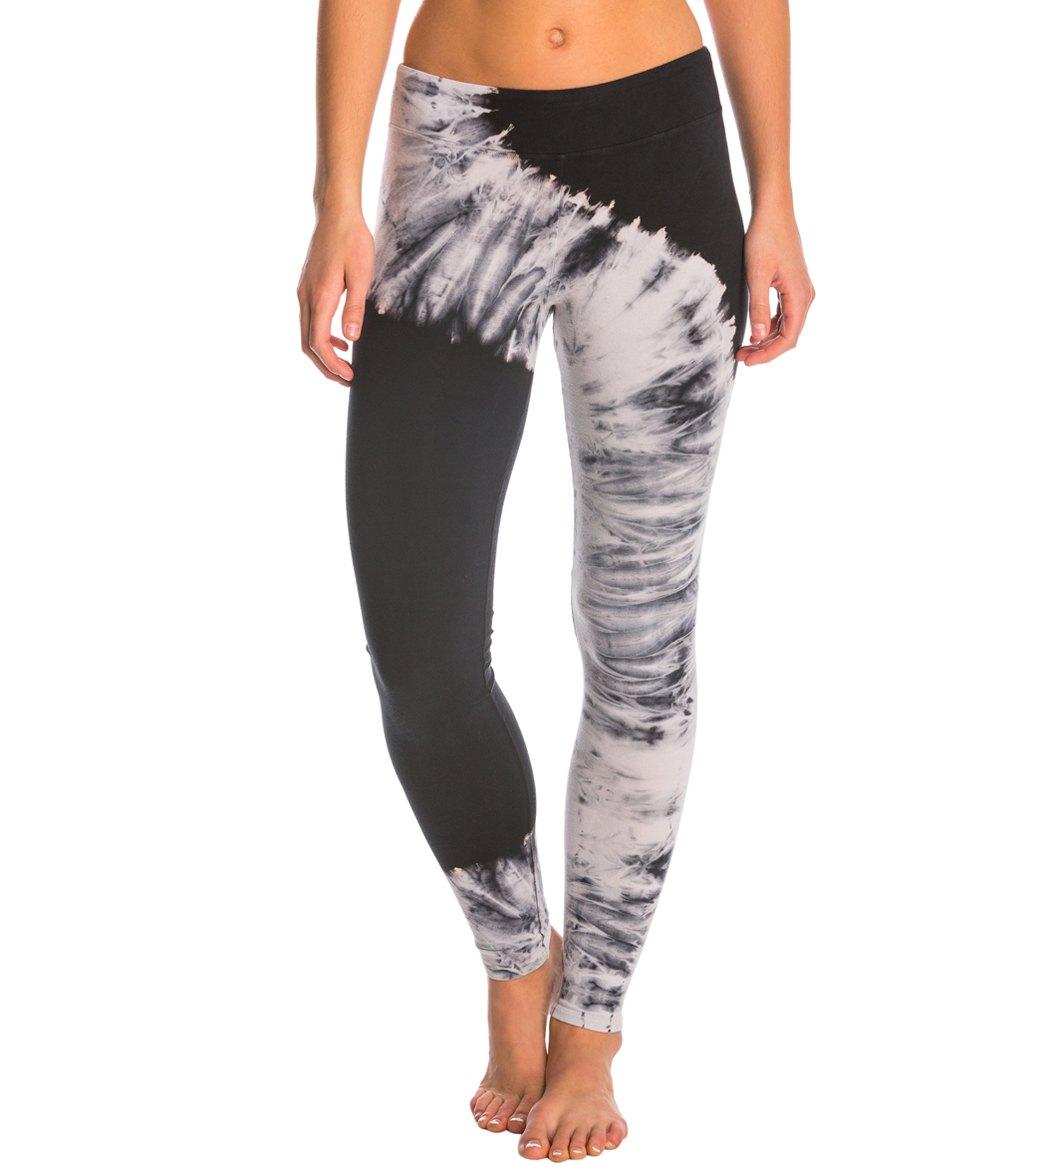 c558e473f8a2 Jala Clothing Tie Dye Yoga Leggings at SwimOutlet.com - Free Shipping